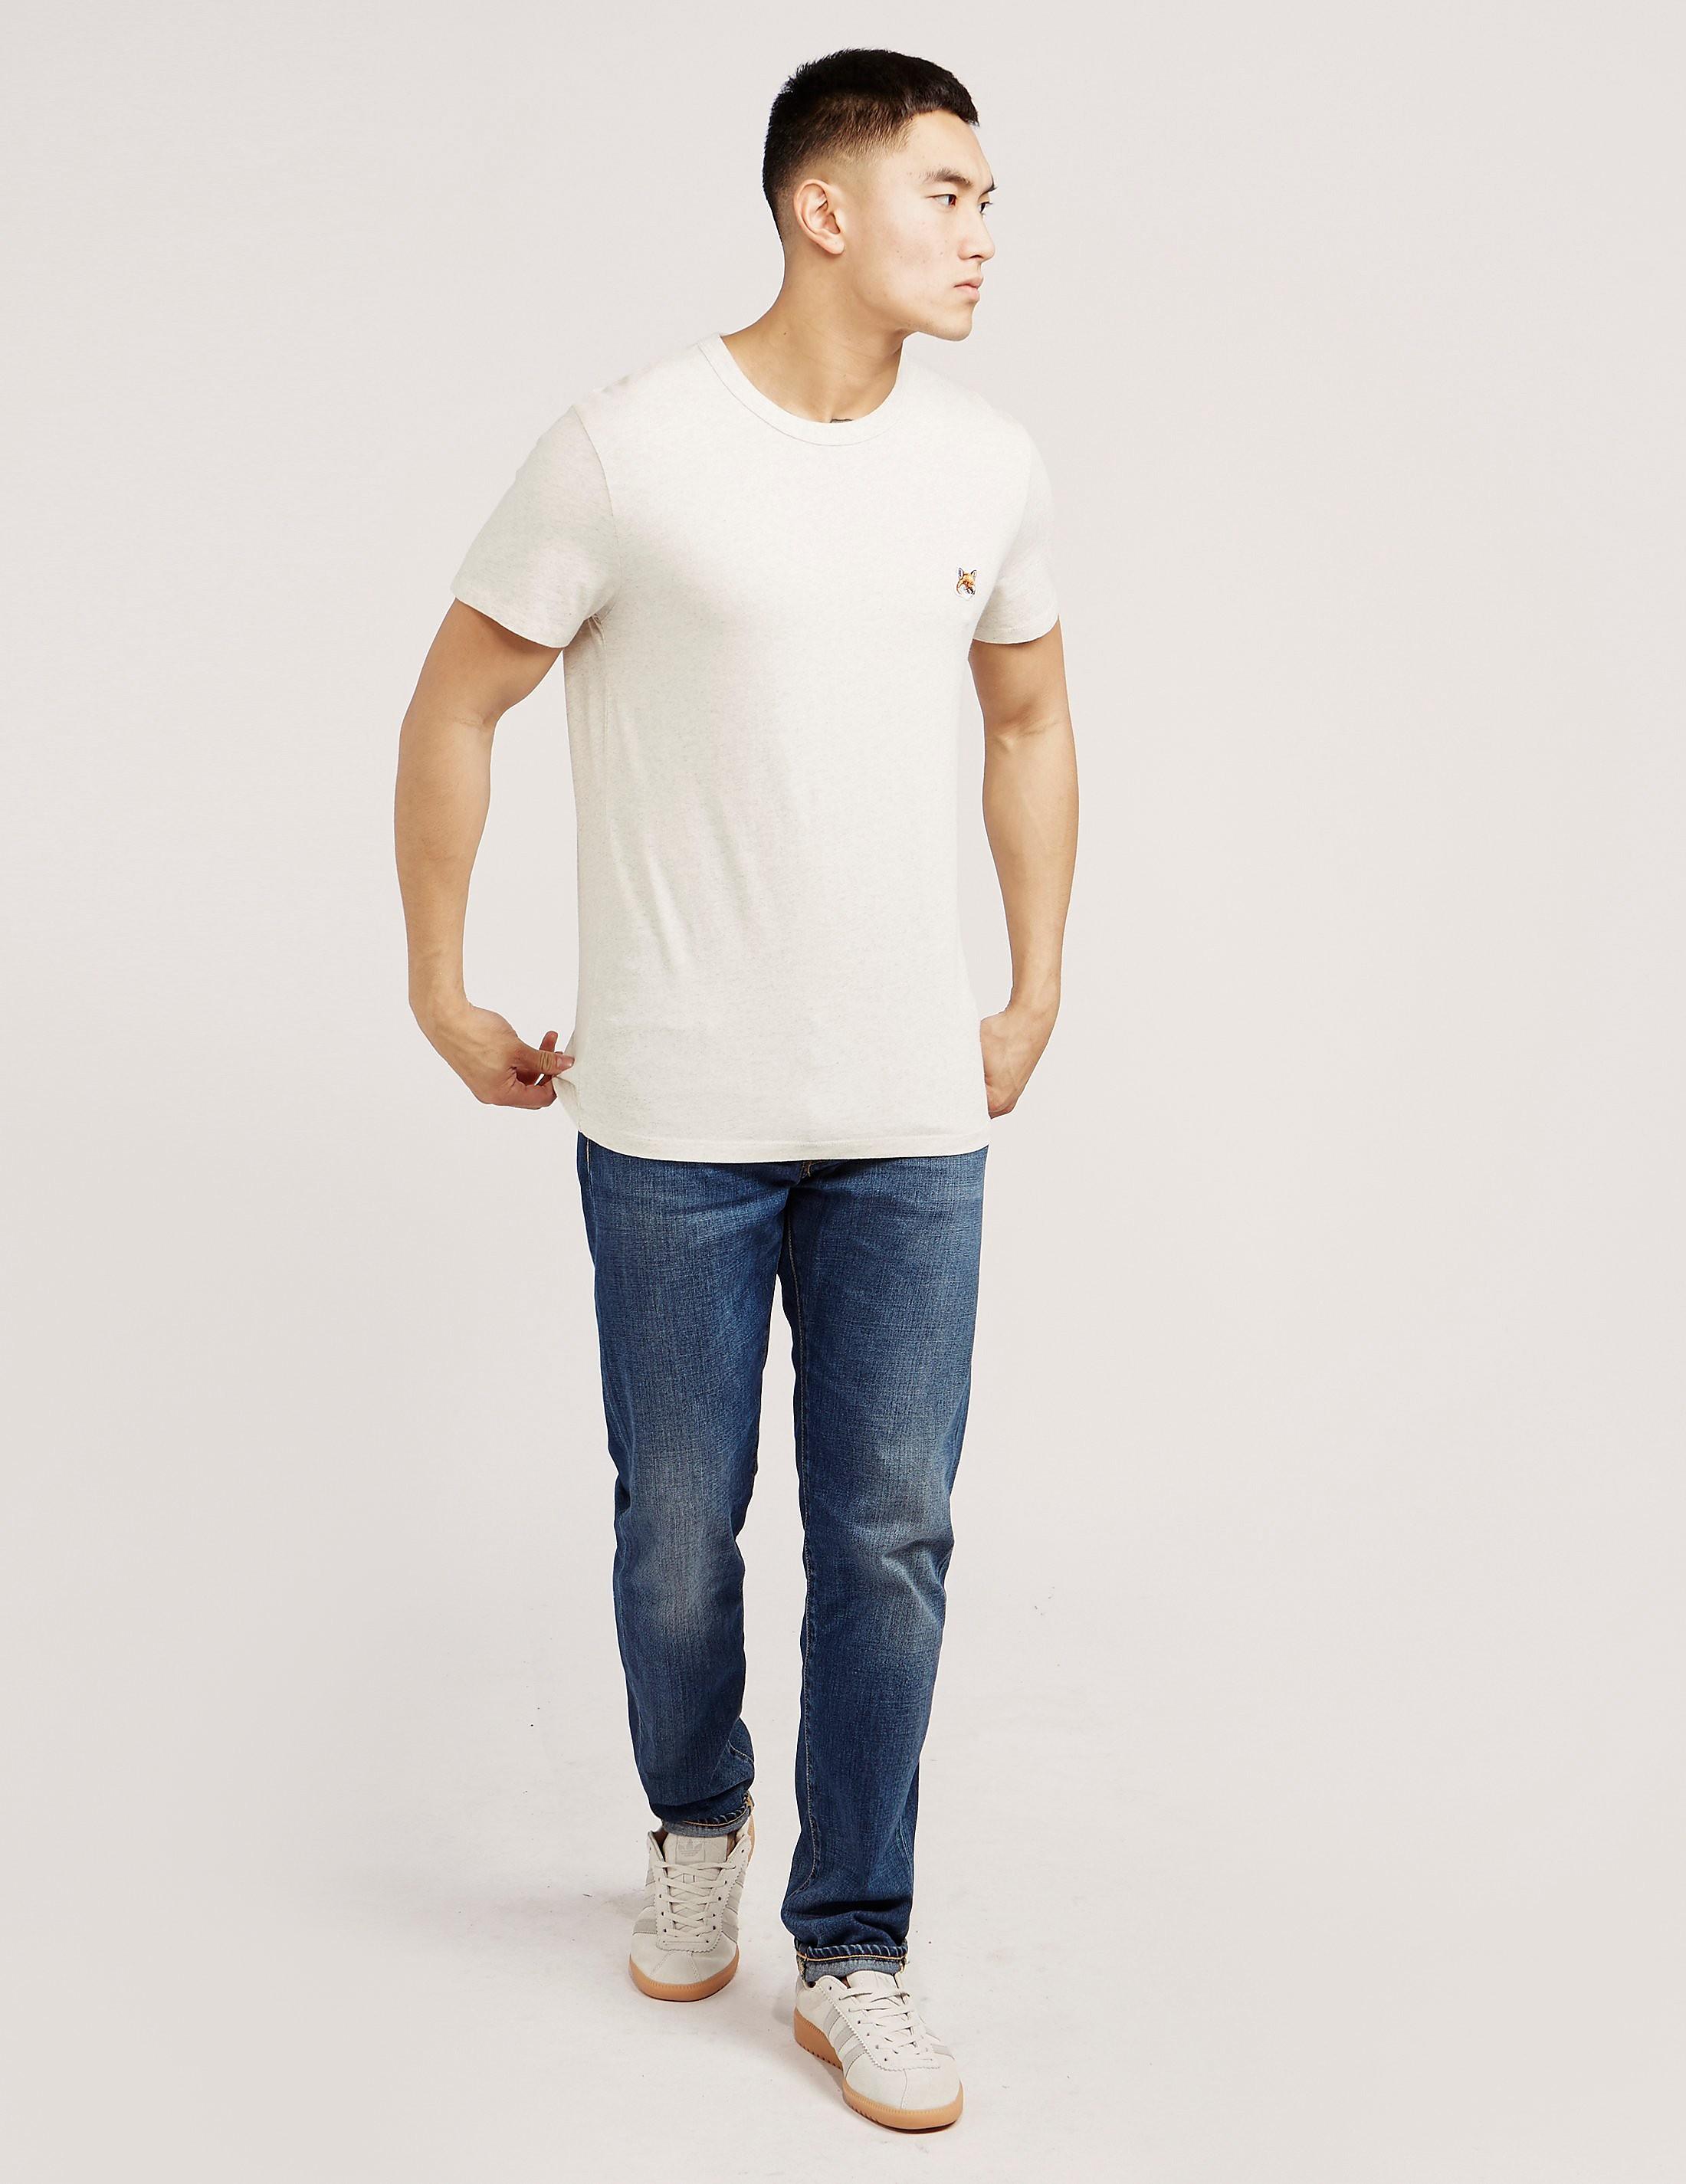 Maison Kitsune Foxhead Short Sleeve T-Shirt